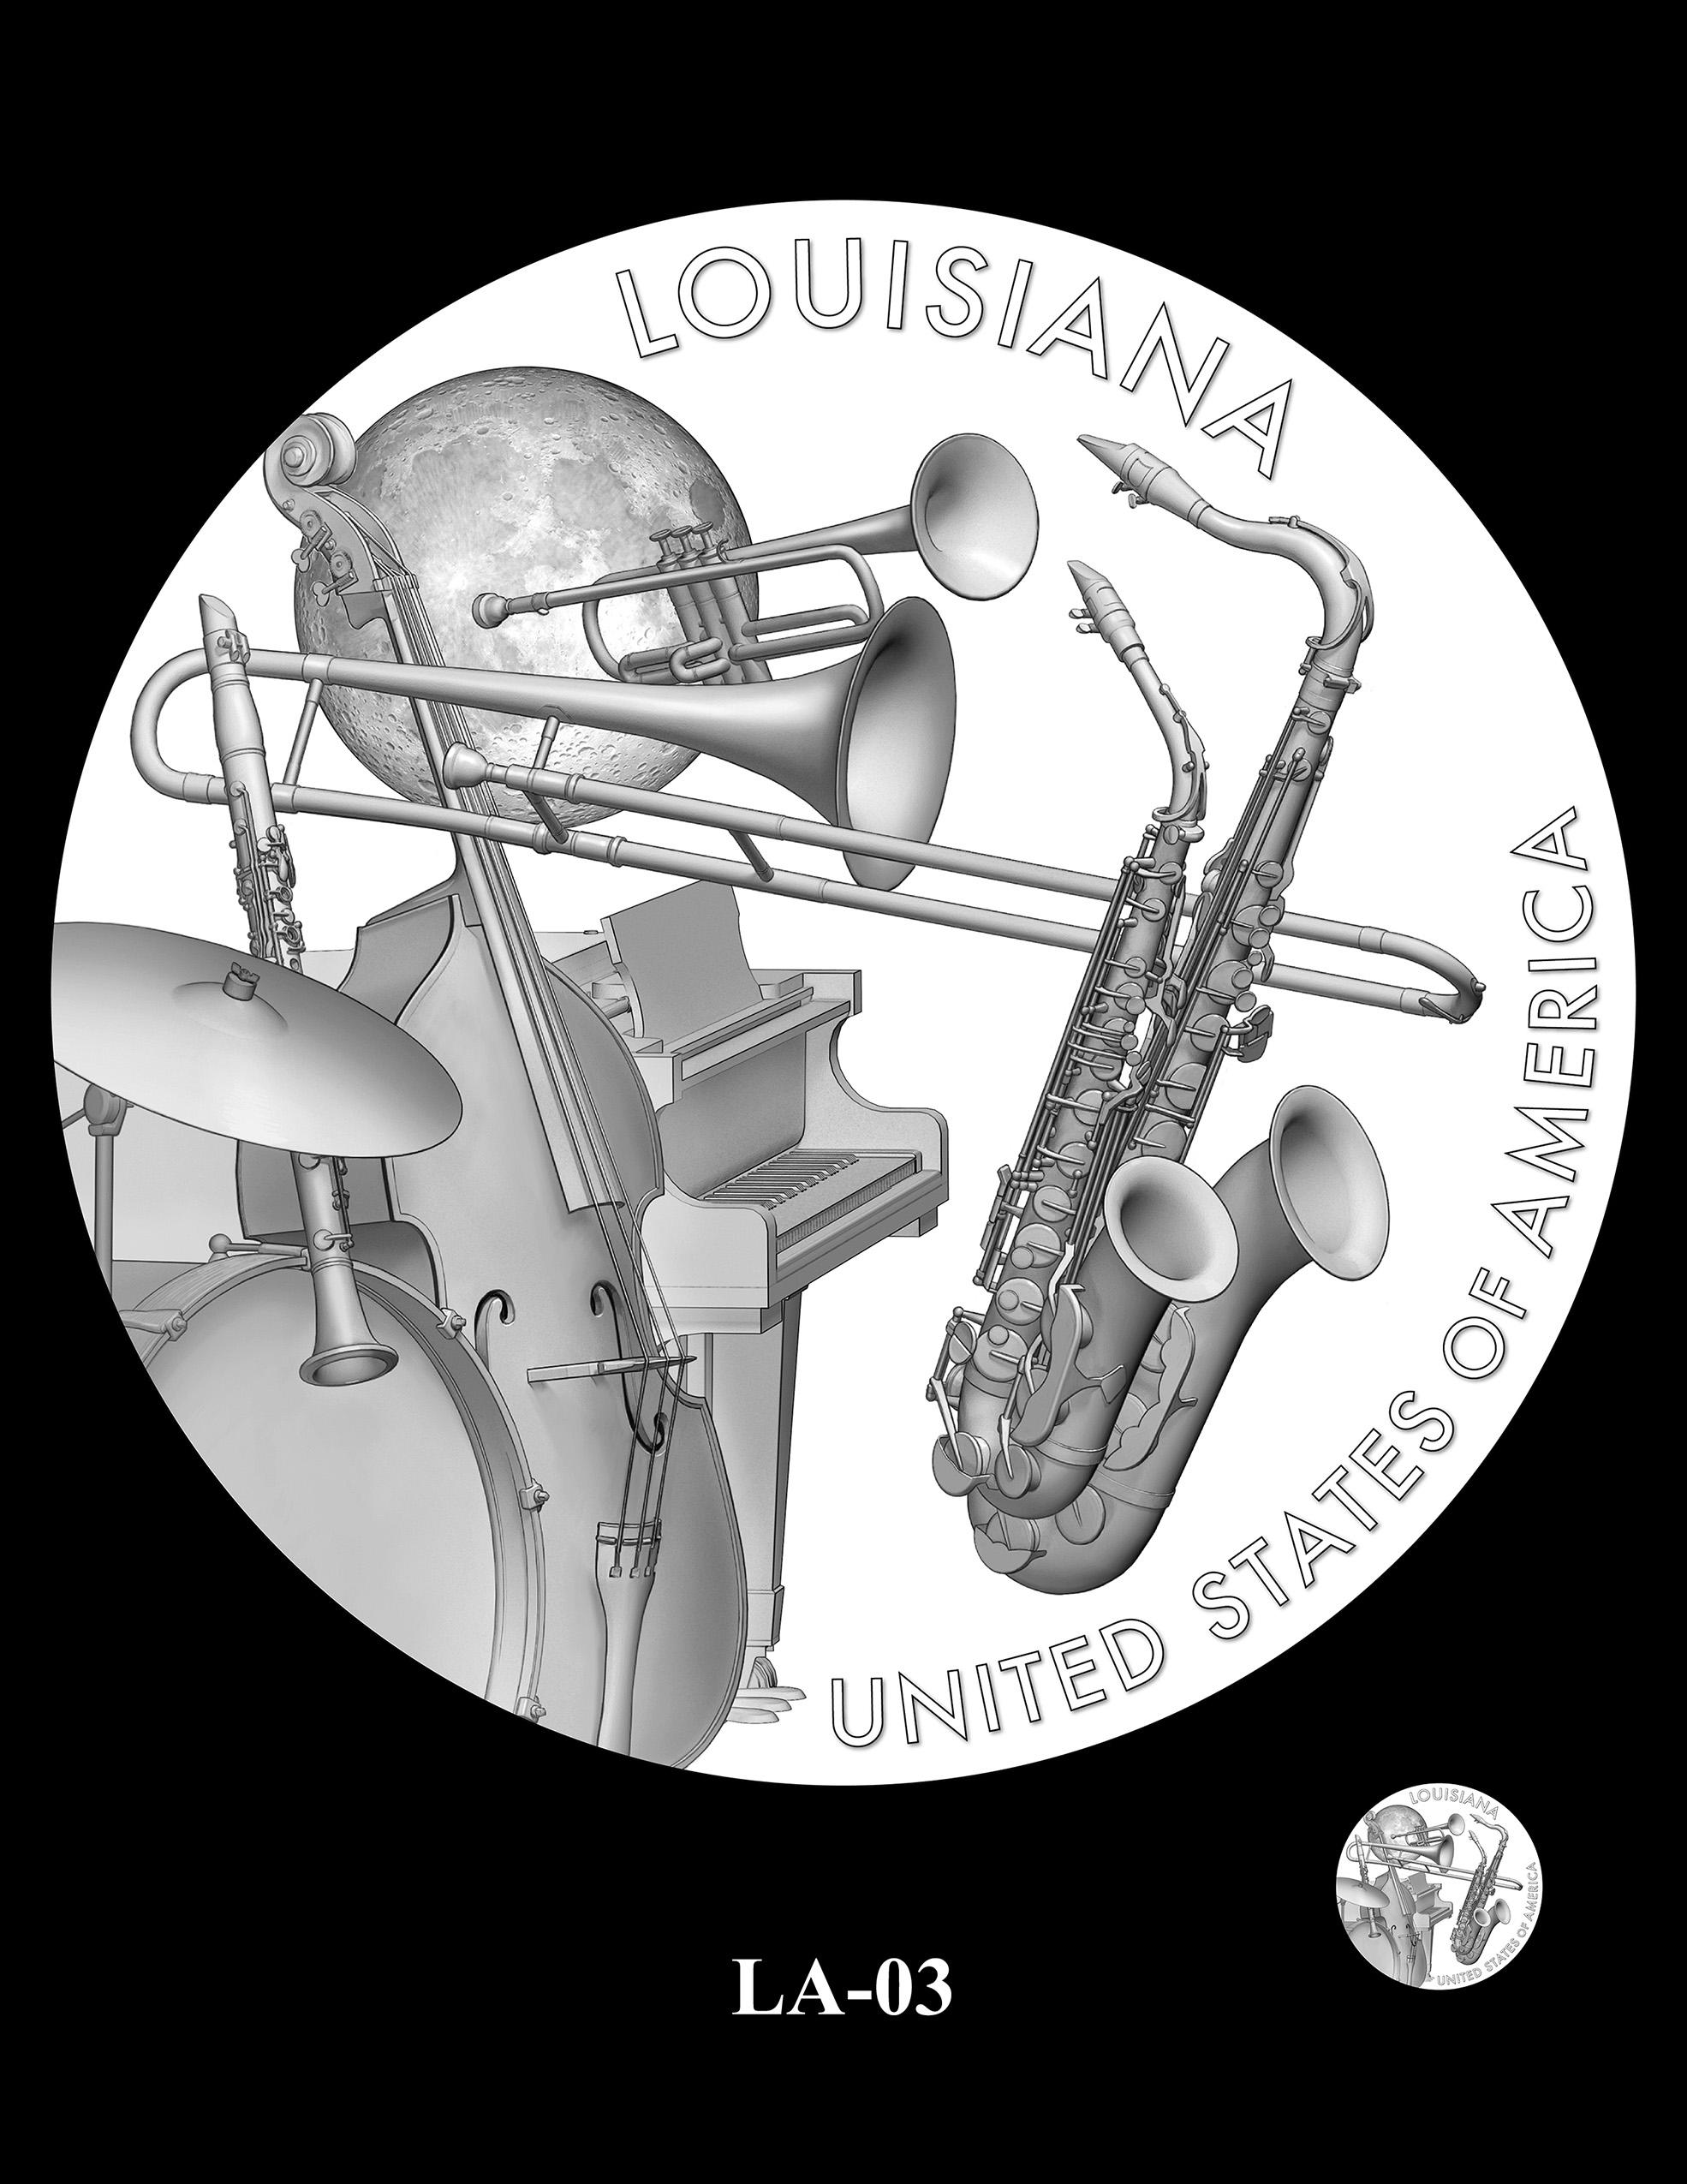 LA-03 -- 2023 American Innovation $1 Coin Program - Louisiana